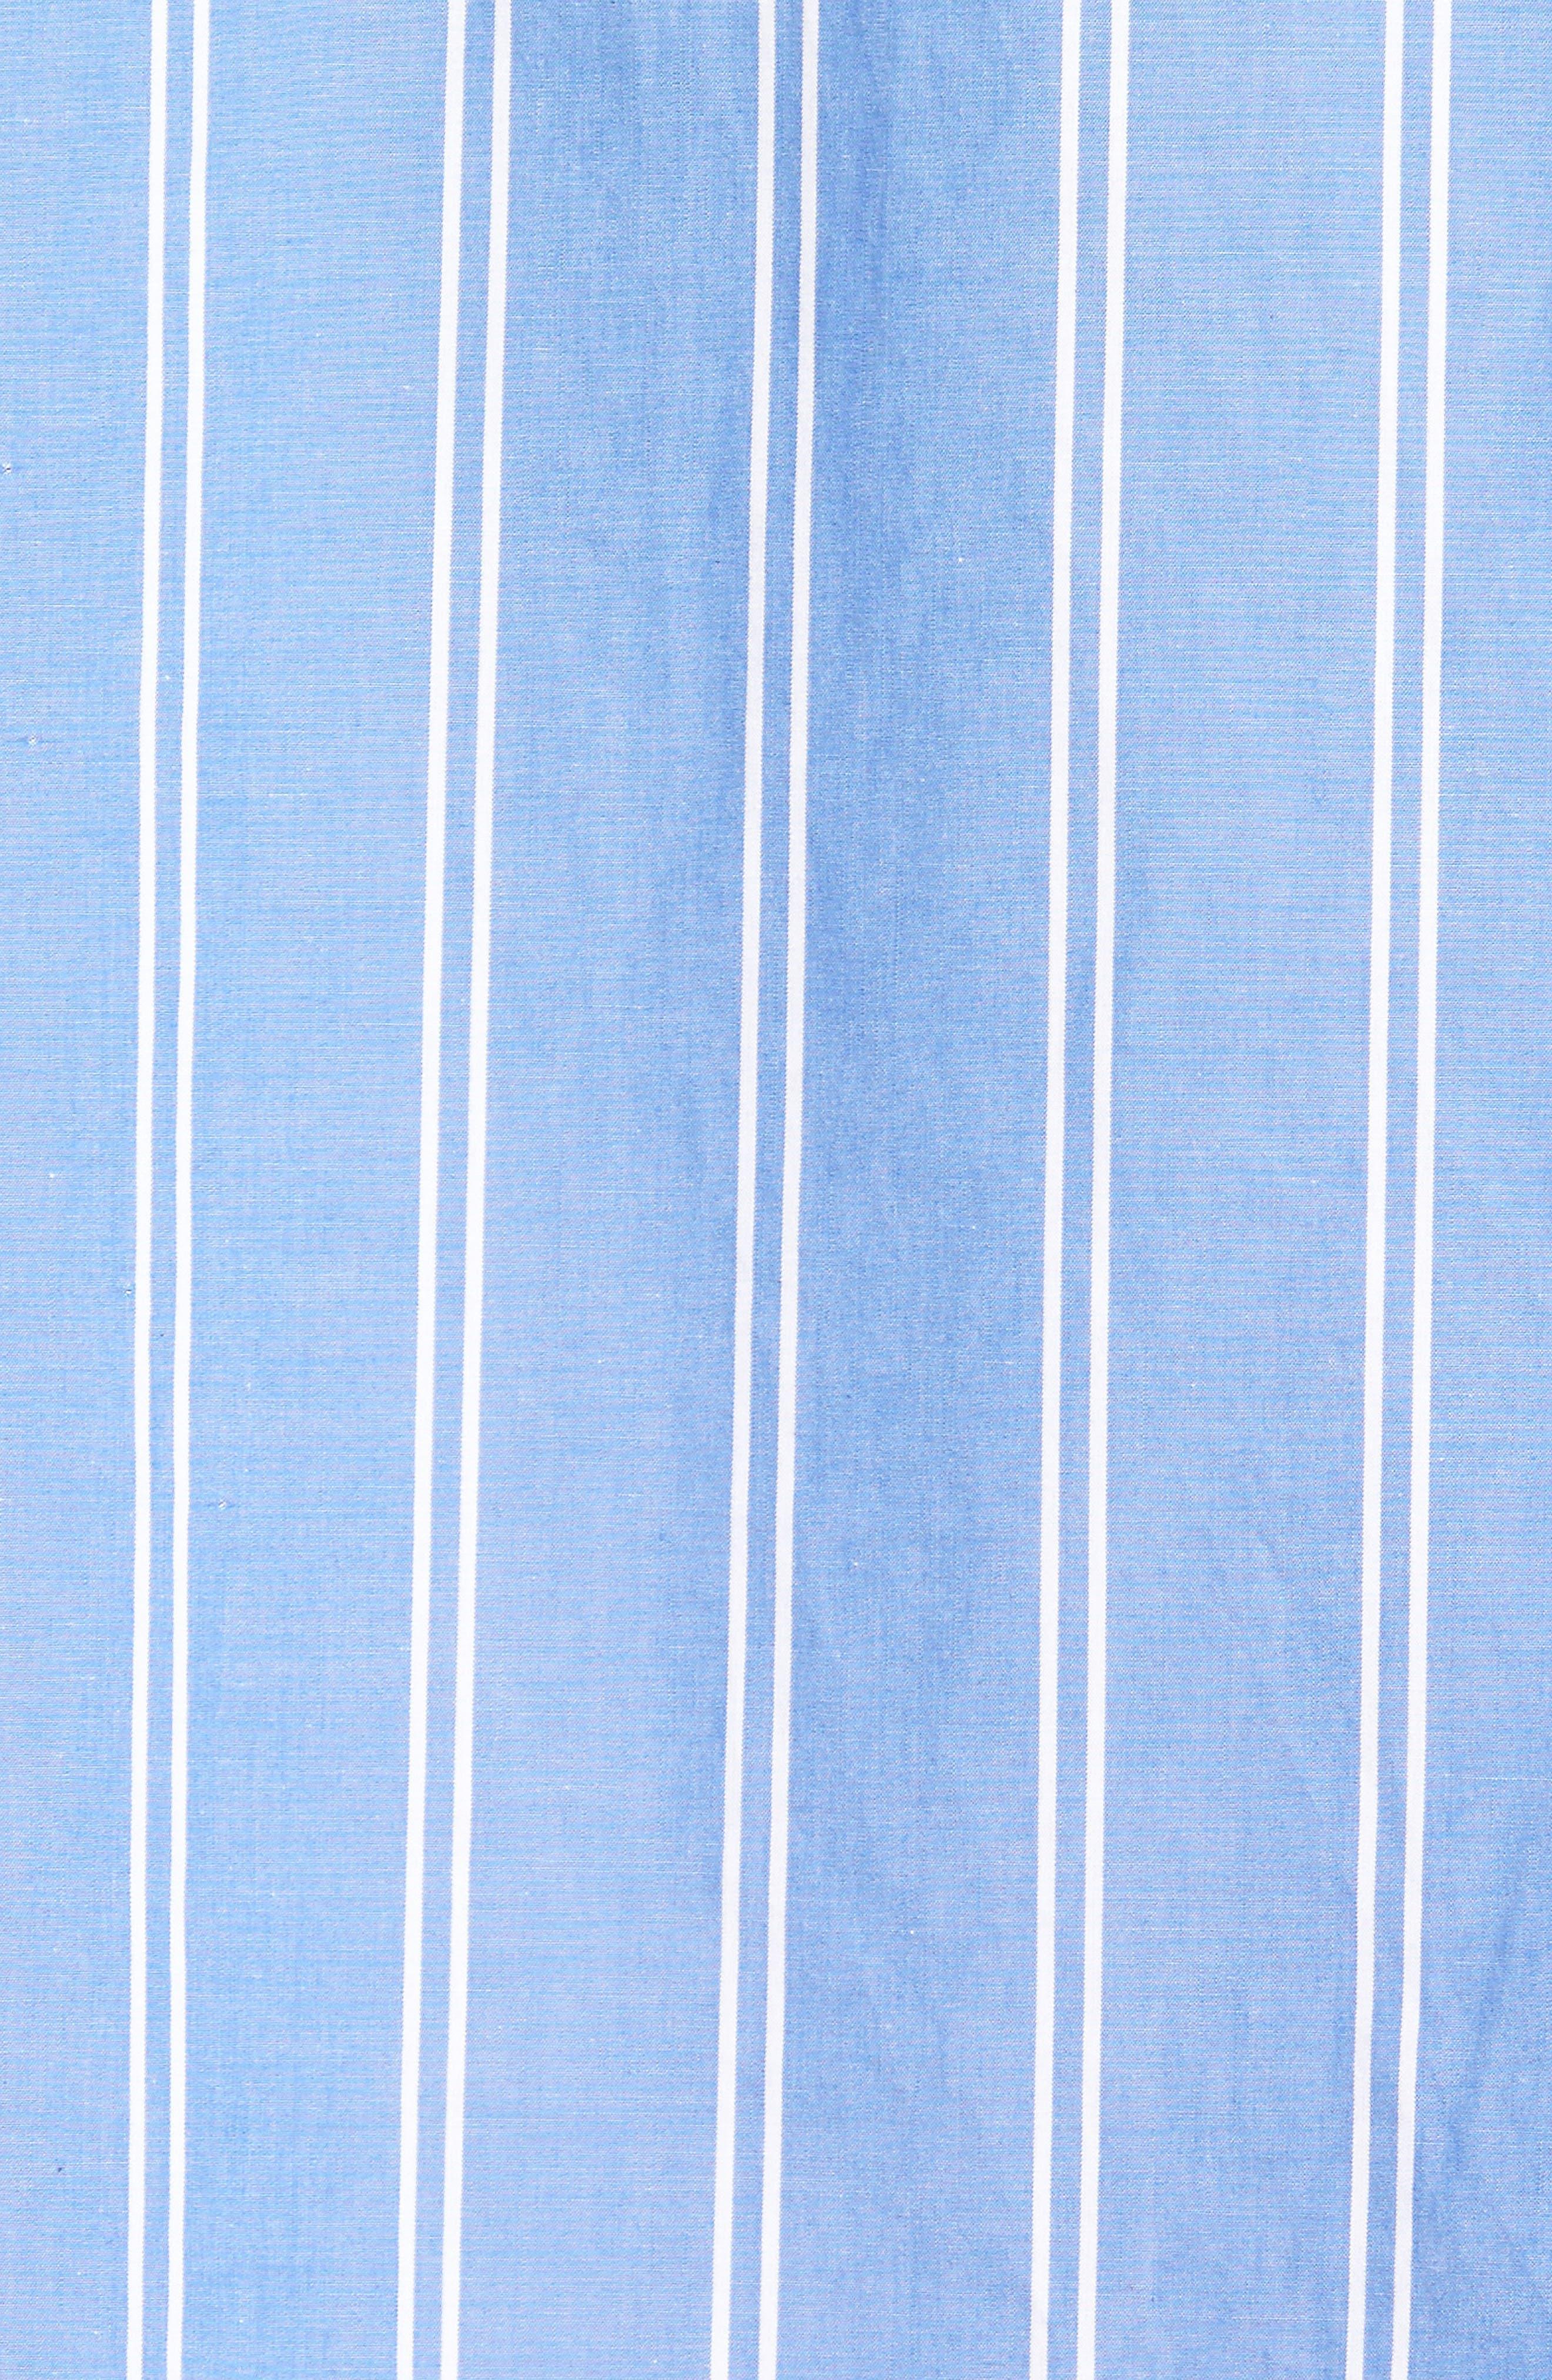 Stripe Step Hem Shirt,                             Alternate thumbnail 8, color,                             Blue Regatta May Stripe